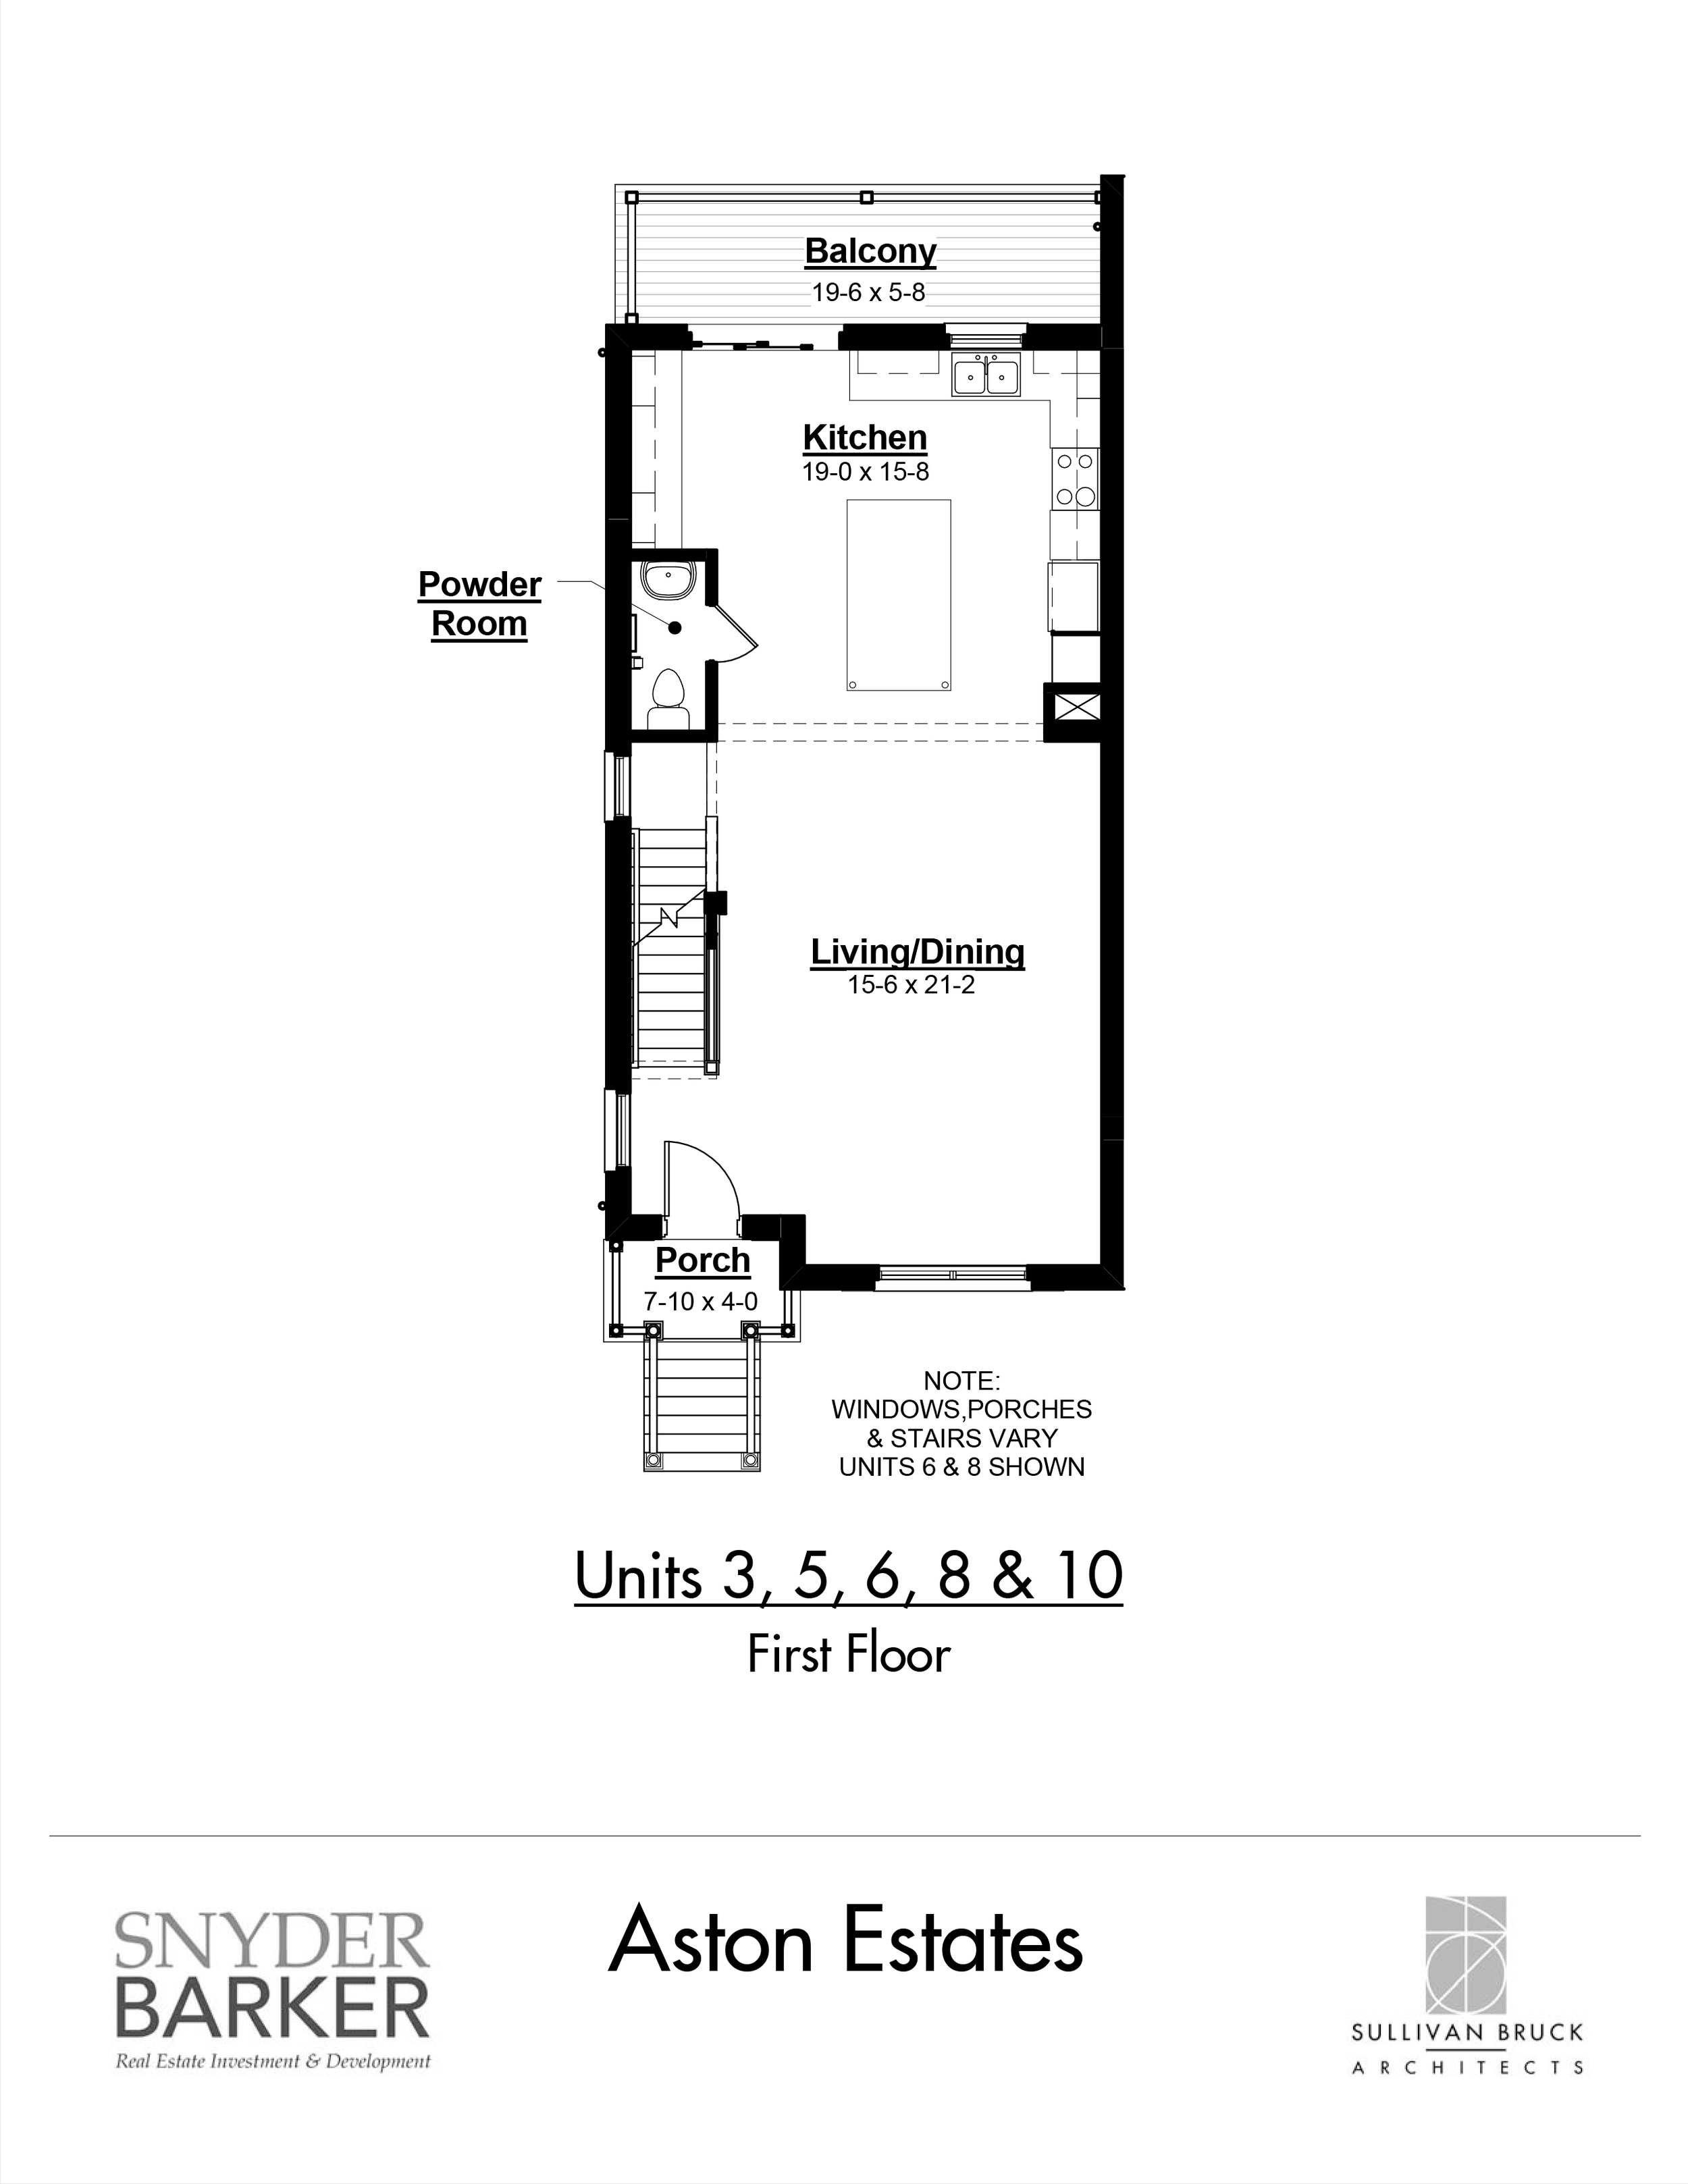 Aston_Estates_Unit_3_5_6_8_10_First_Floor.jpg